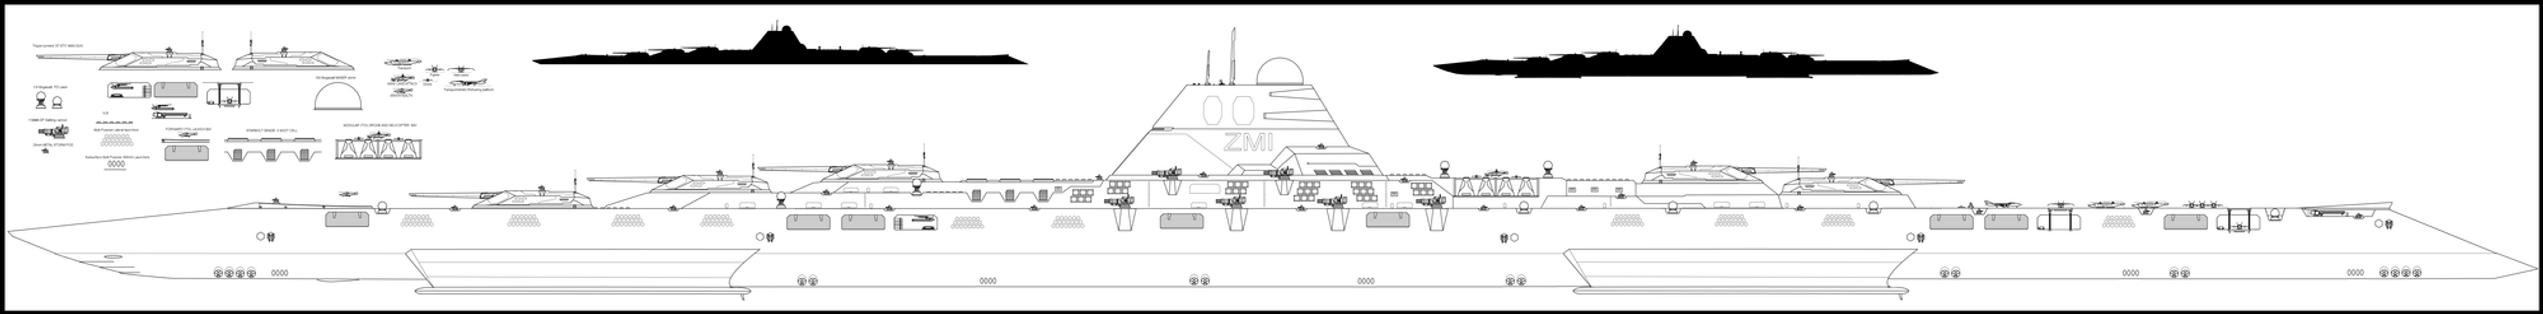 Gestalt class SuperDreadnought by Lineartbob